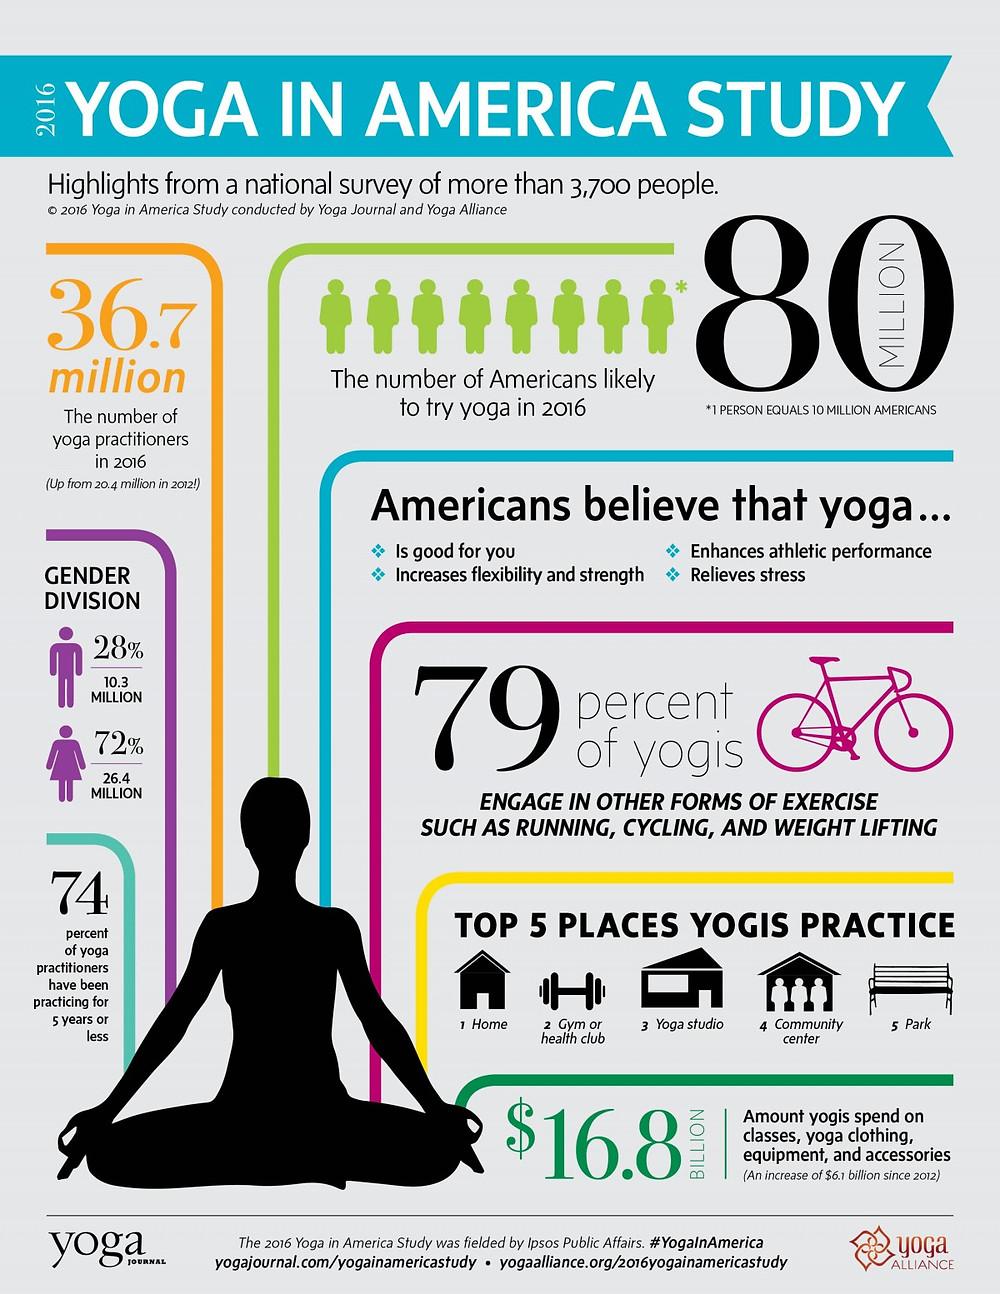 2016 Yoga in America Study